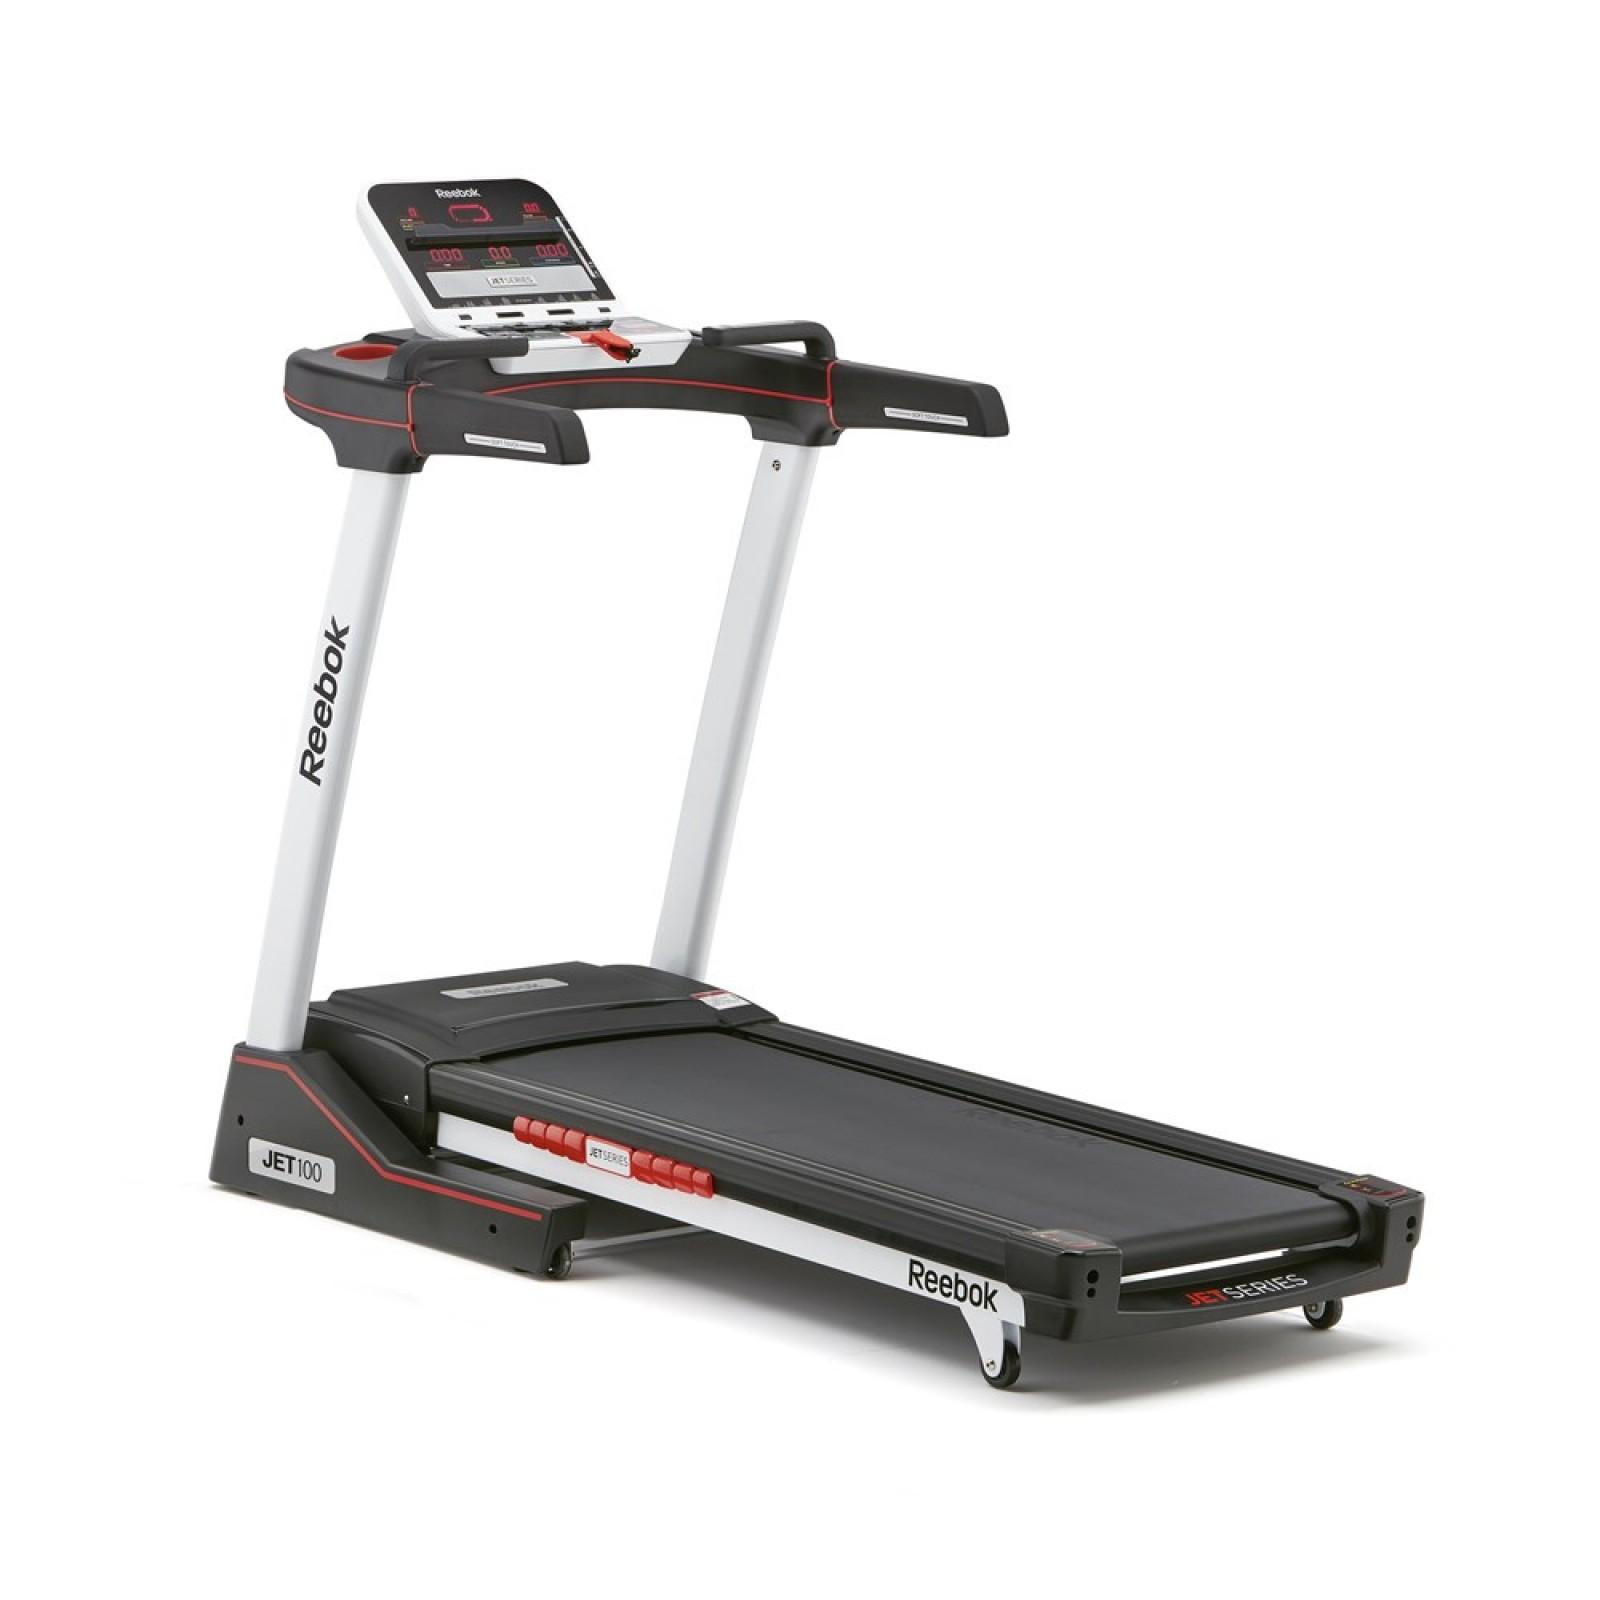 Cybex Treadmill Speed Calibration: Reebok Treadmill Jet 100 Buy With 17 Customer Ratings